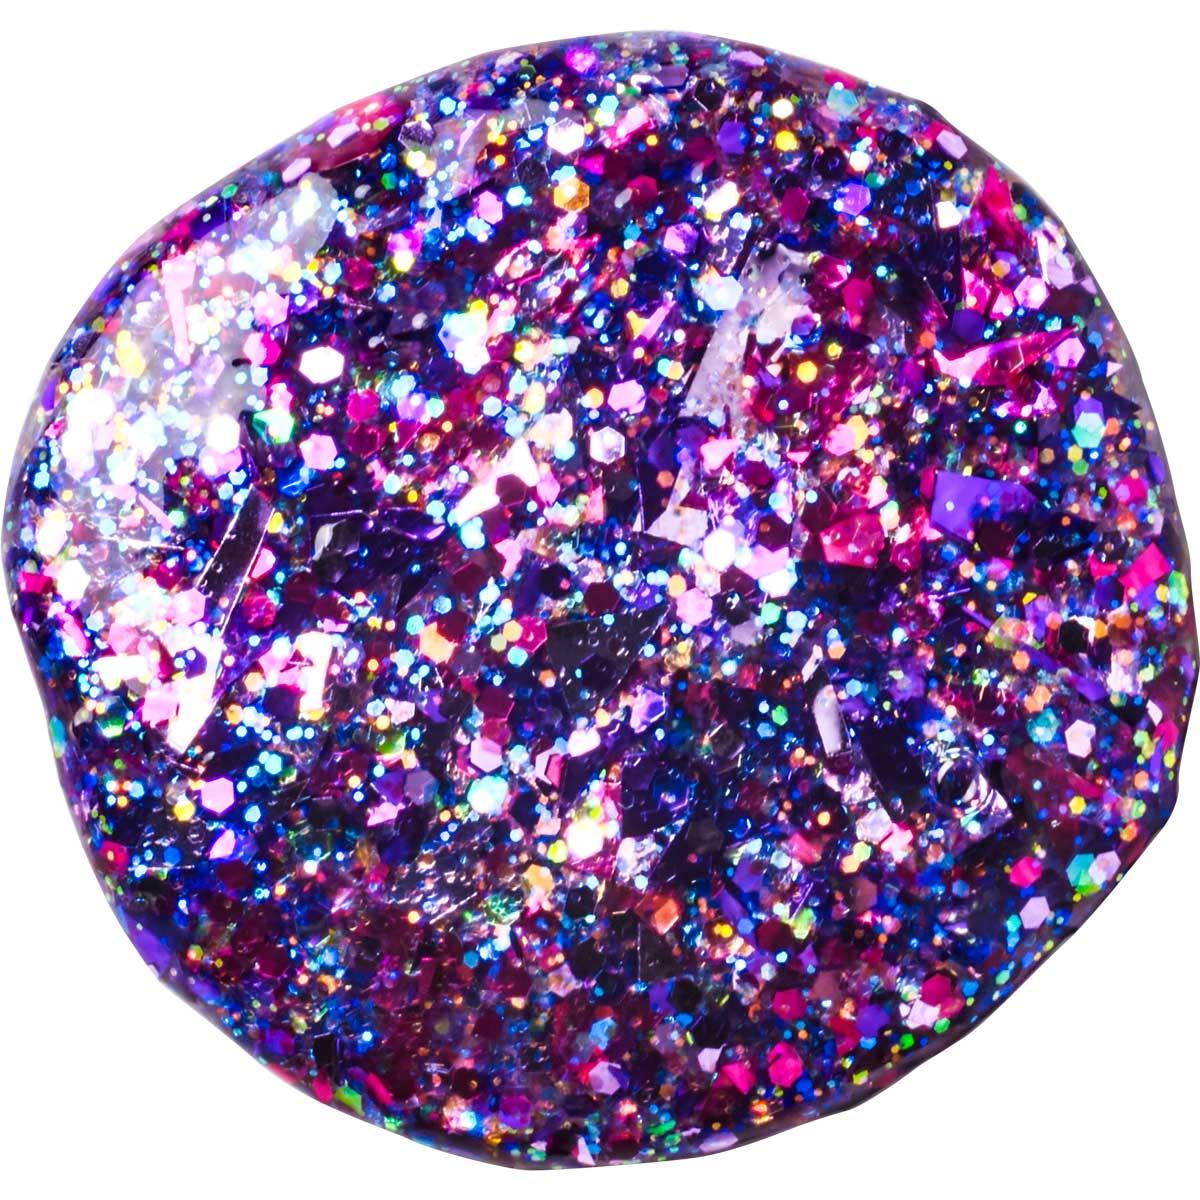 FolkArt ® Glitterific™ Acrylic Paint - Princess, 2 oz. - 5931